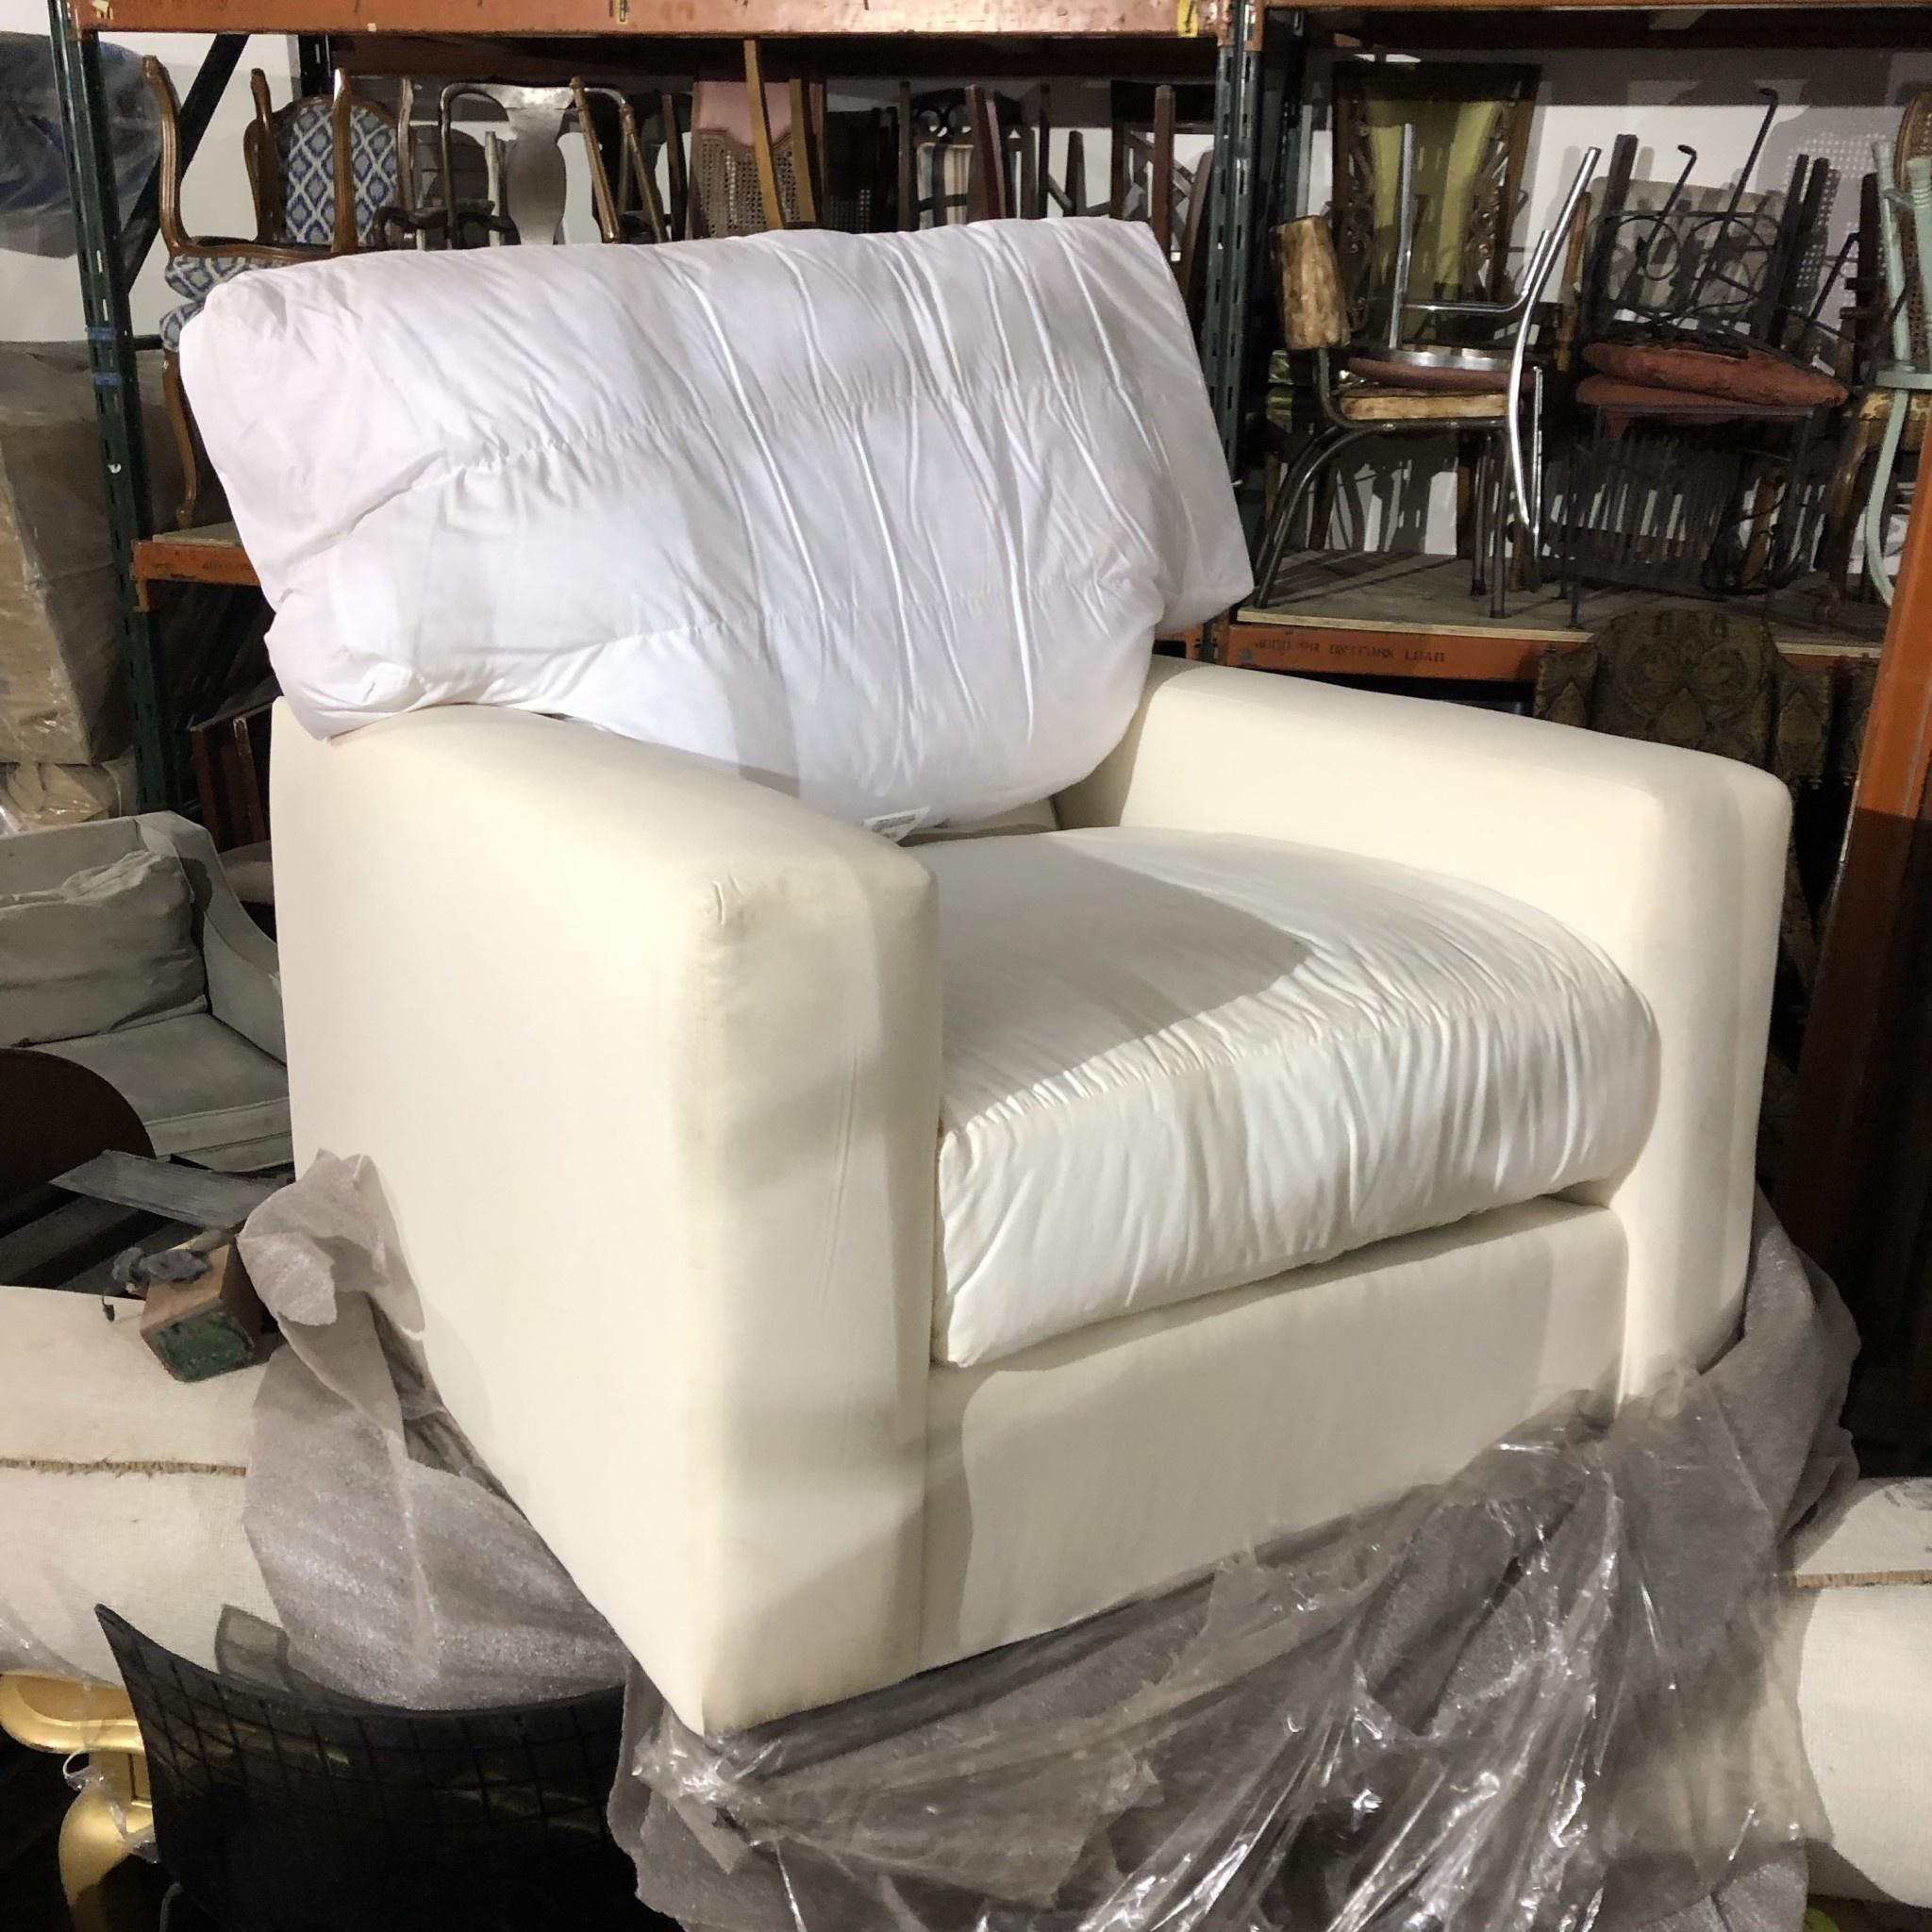 Sofas w/ No Seat Covers